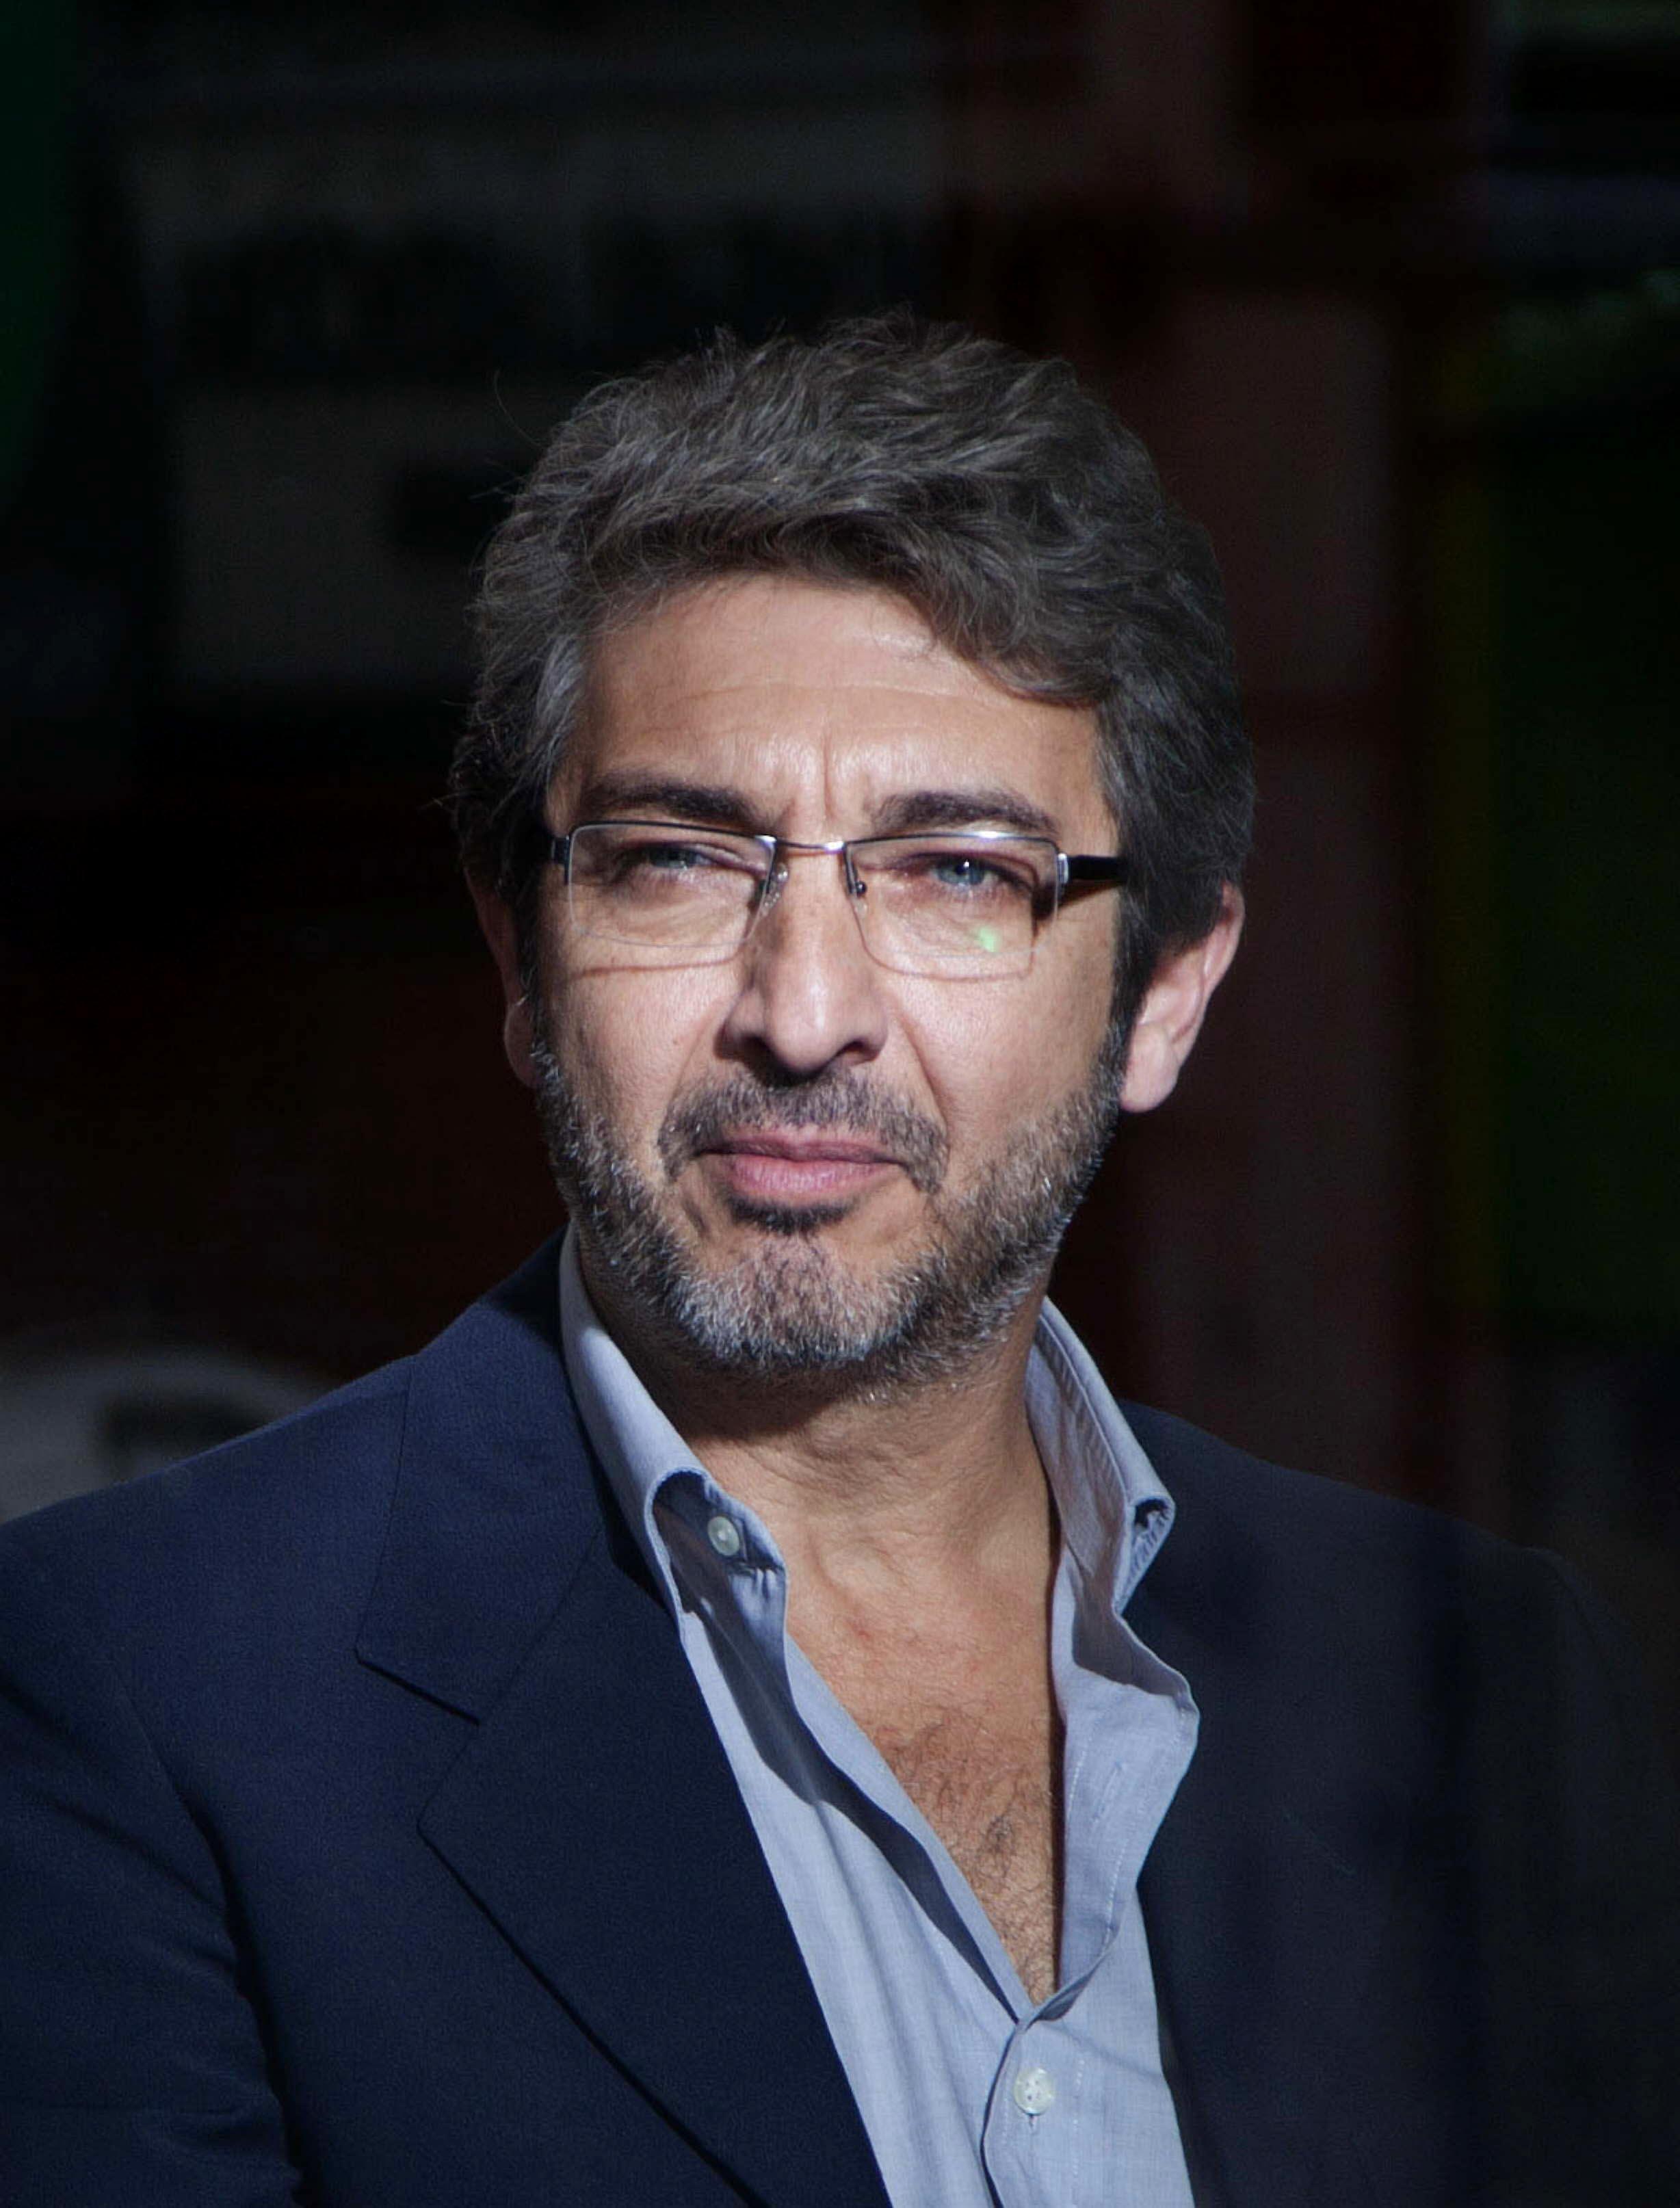 Ricardo Darin